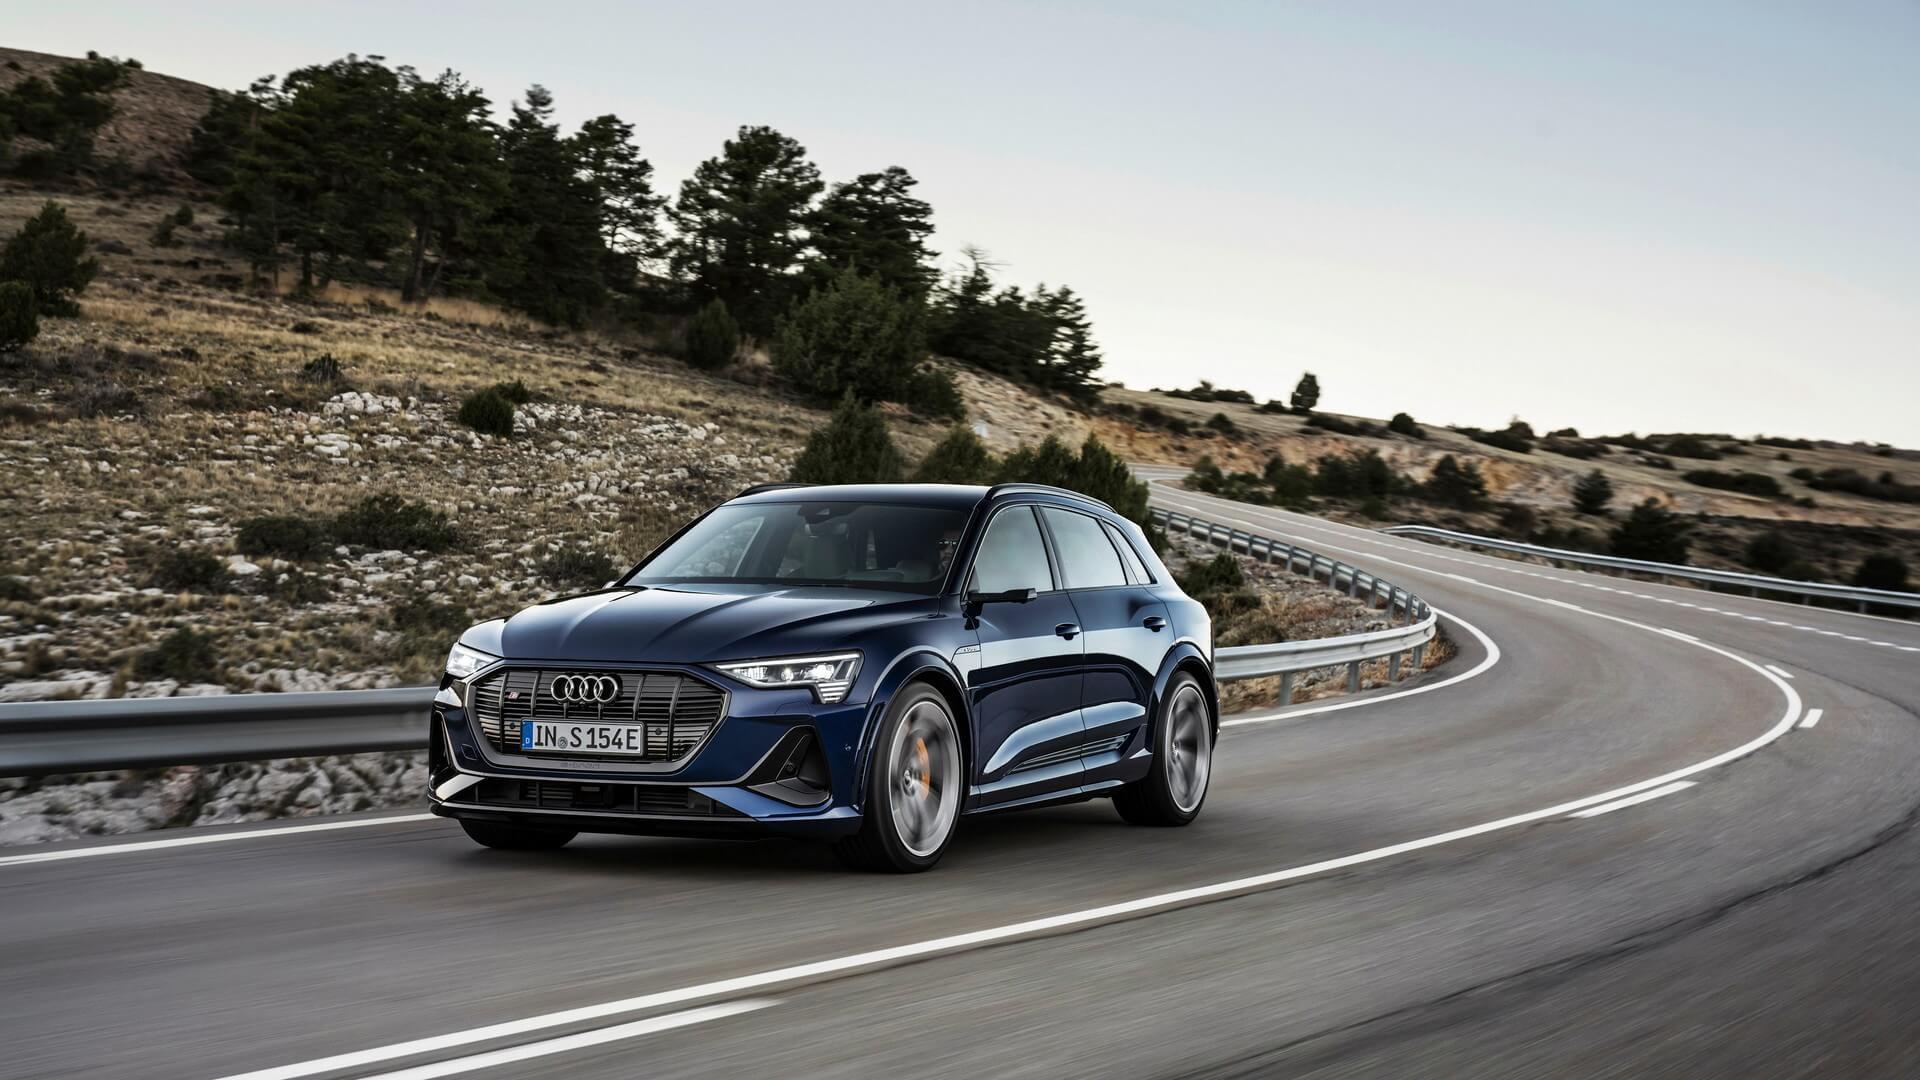 Audi-E-Tron-S-and-E-Tron-S-Sportback-2020-5